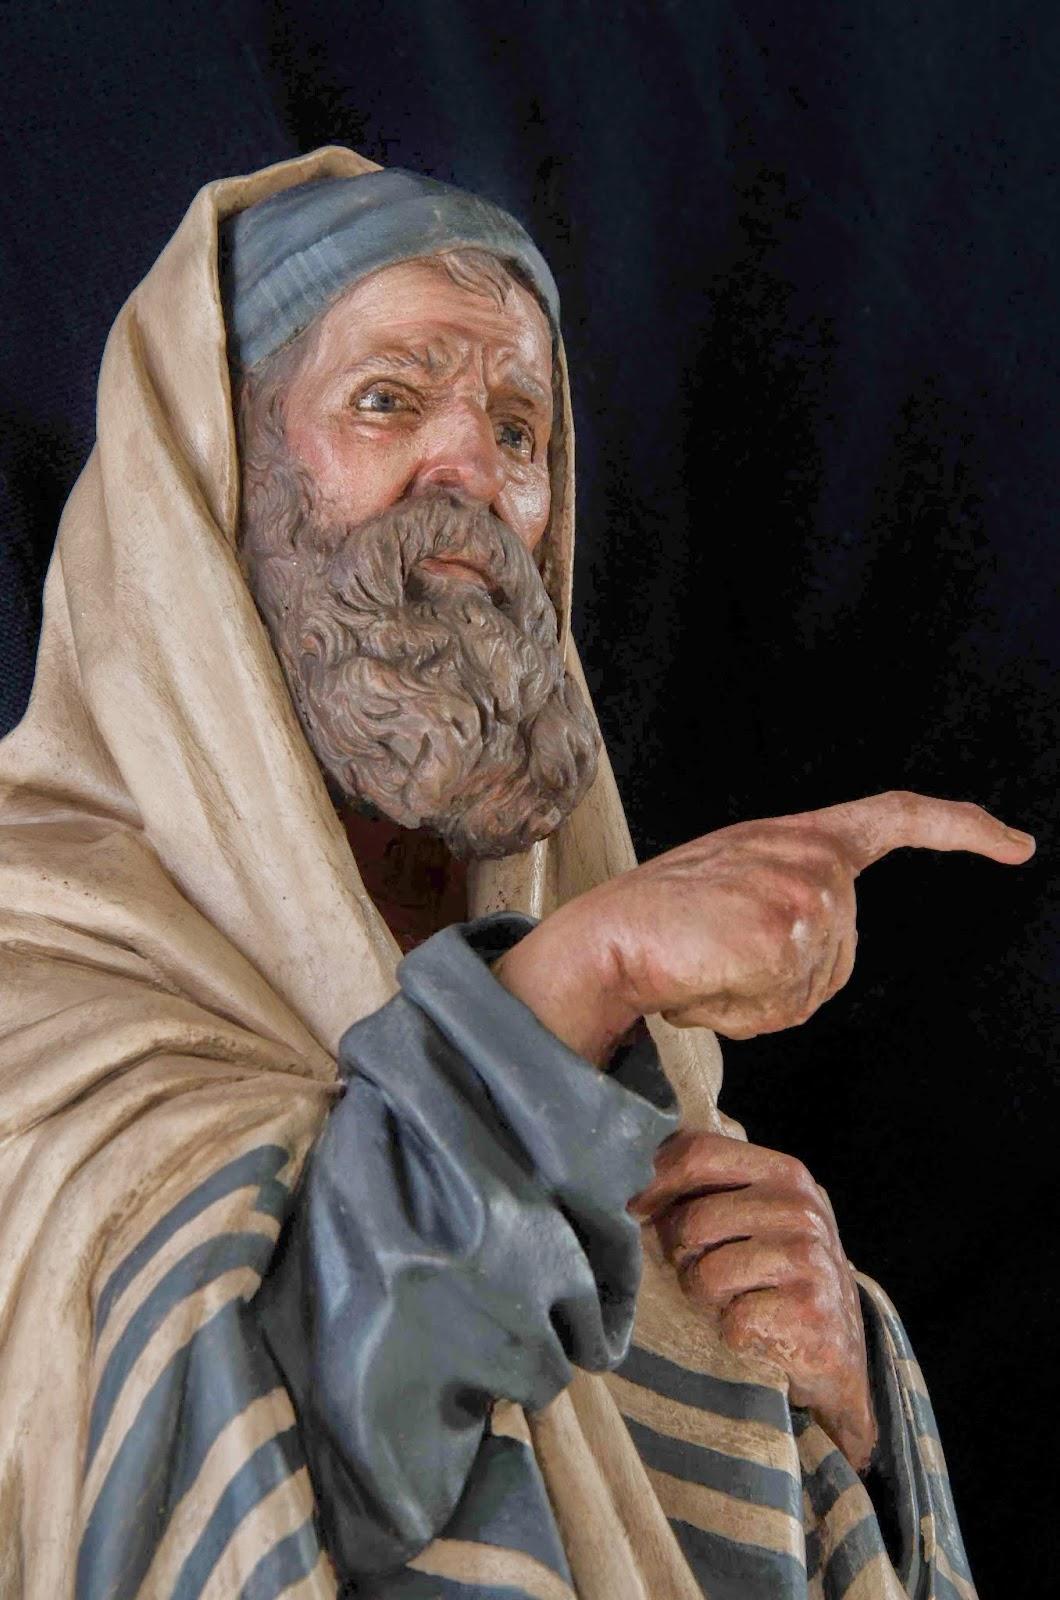 Belén presepe nativity Arturo Serra escultura barro cocido 7